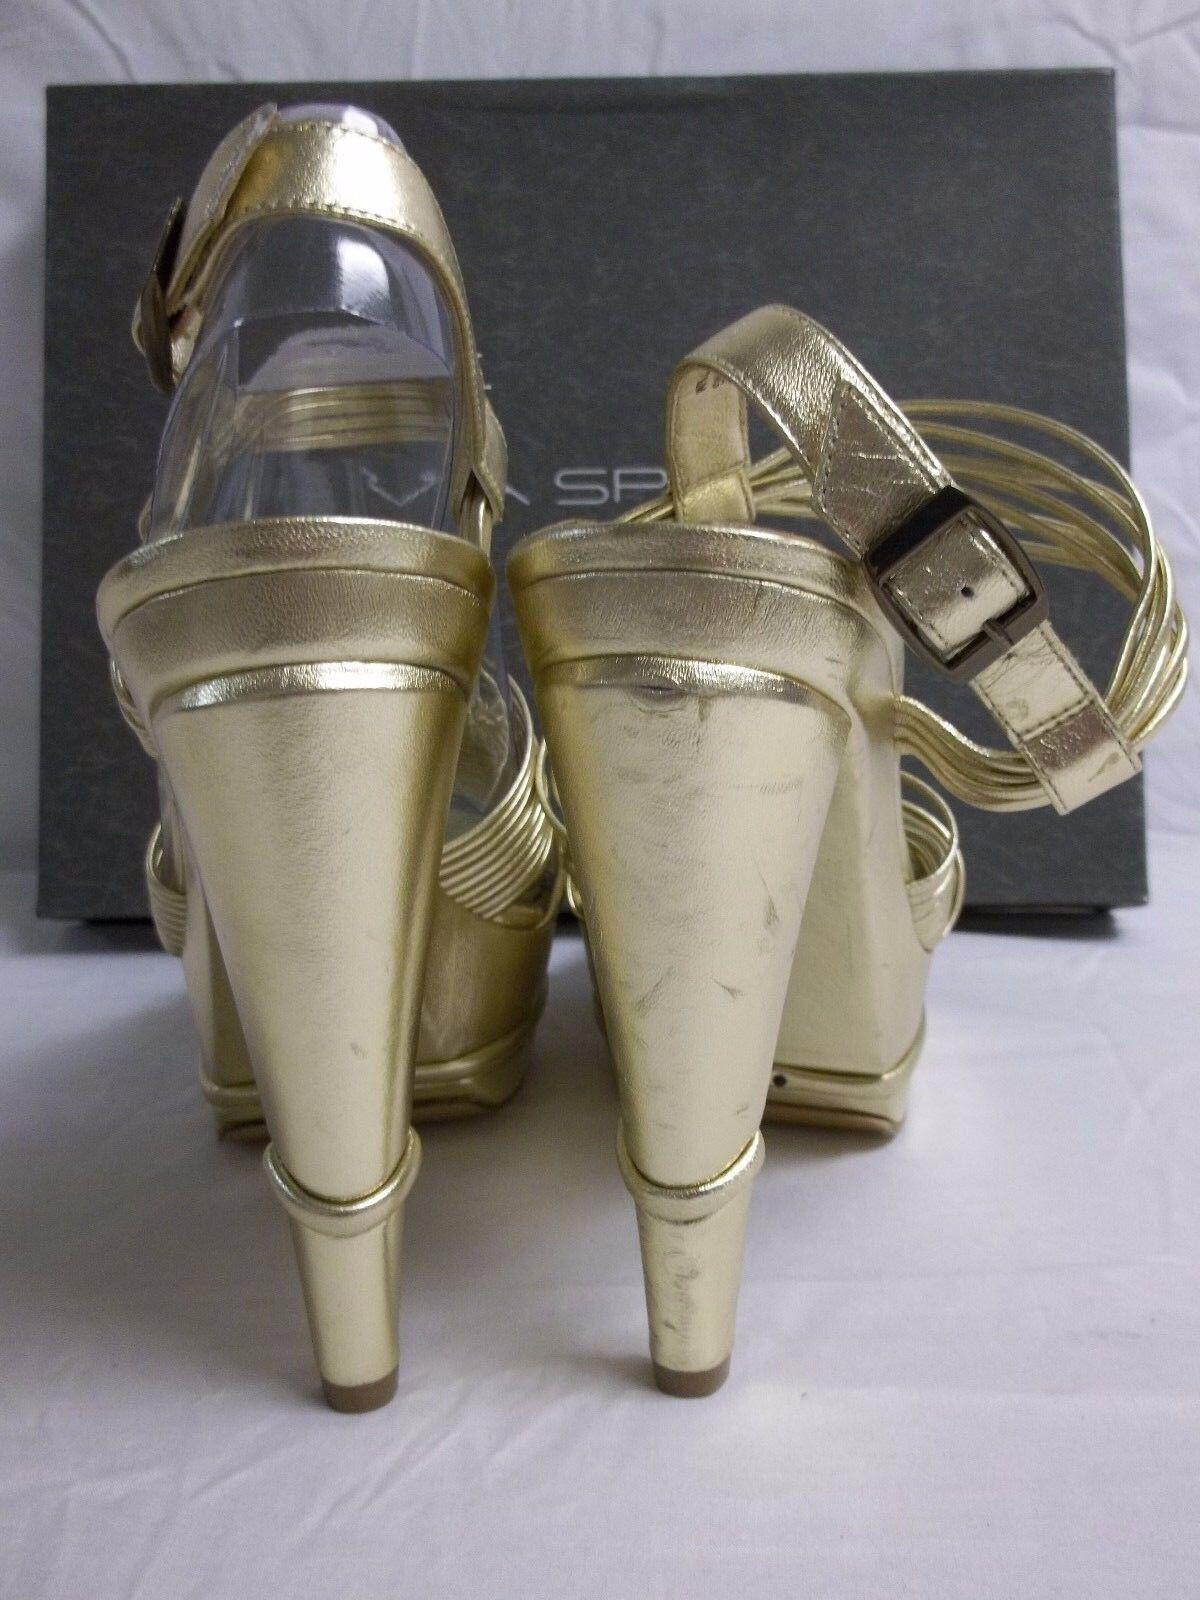 Via Spiga Größe 7.5 M Aida Aida Aida Gold Leder Open Toe Heels New Damenschuhe Schuhes NWB a9475e